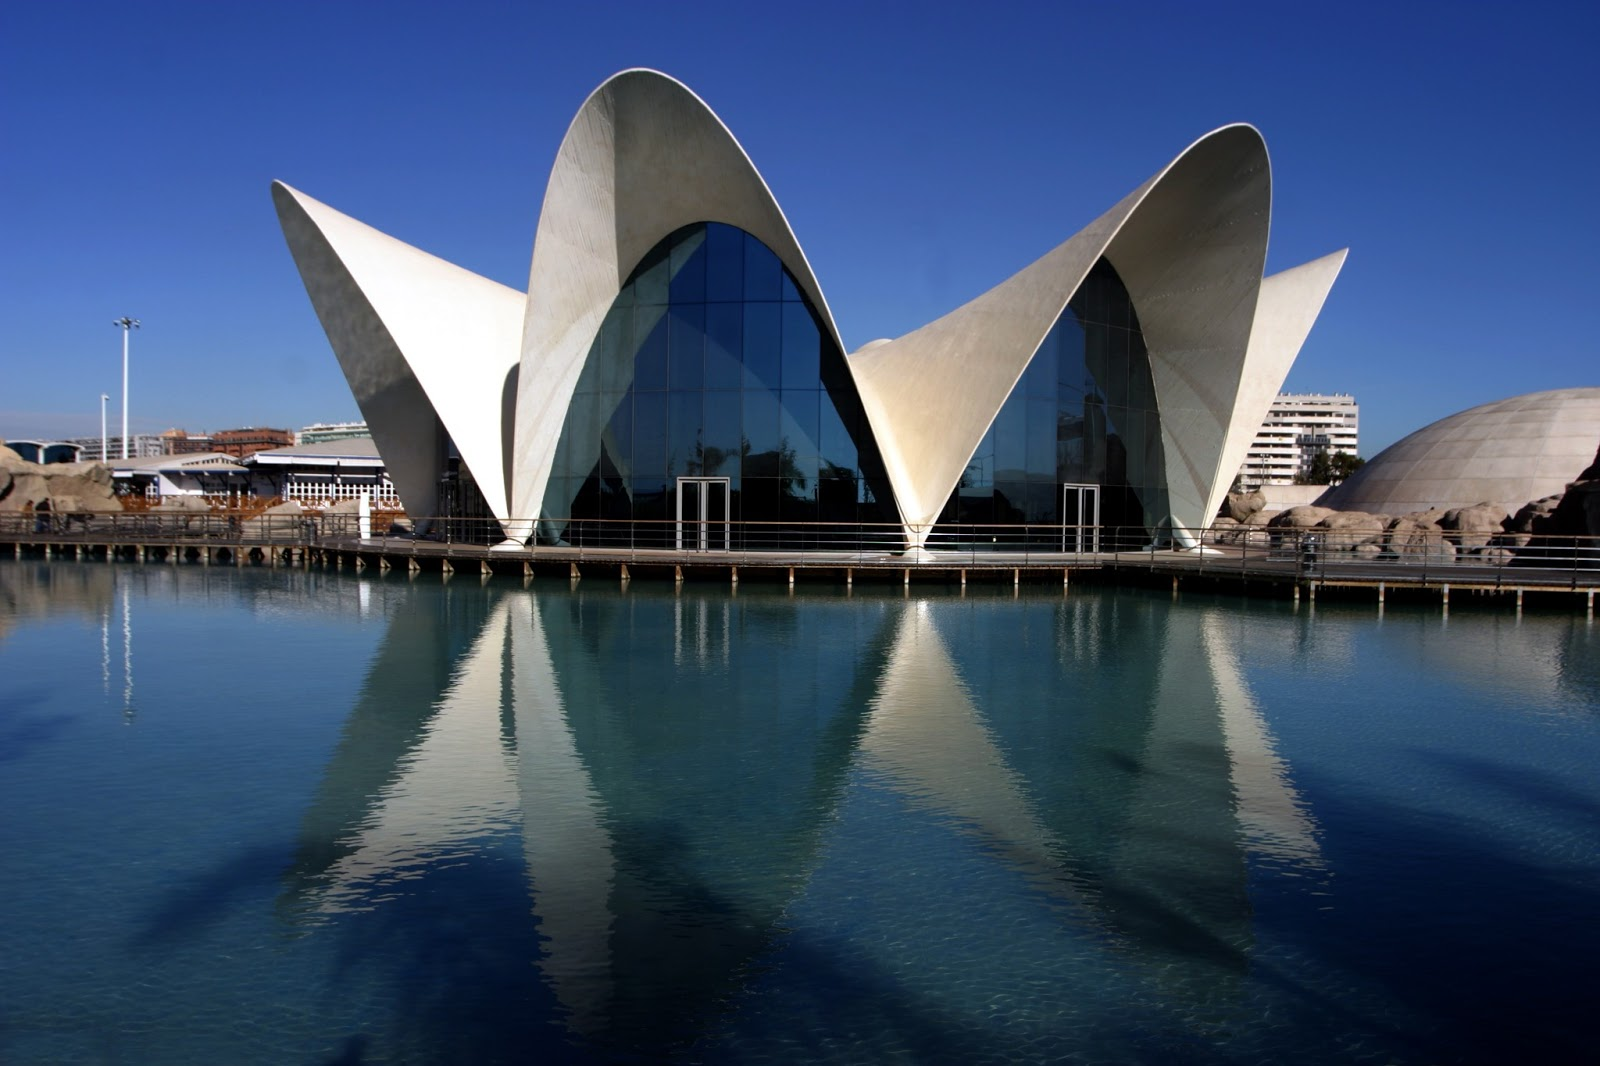 #284881 Inova Vidros: Vidro & Arquitetura Obras Incríveis 1580 Vidros Janelas Fortaleza